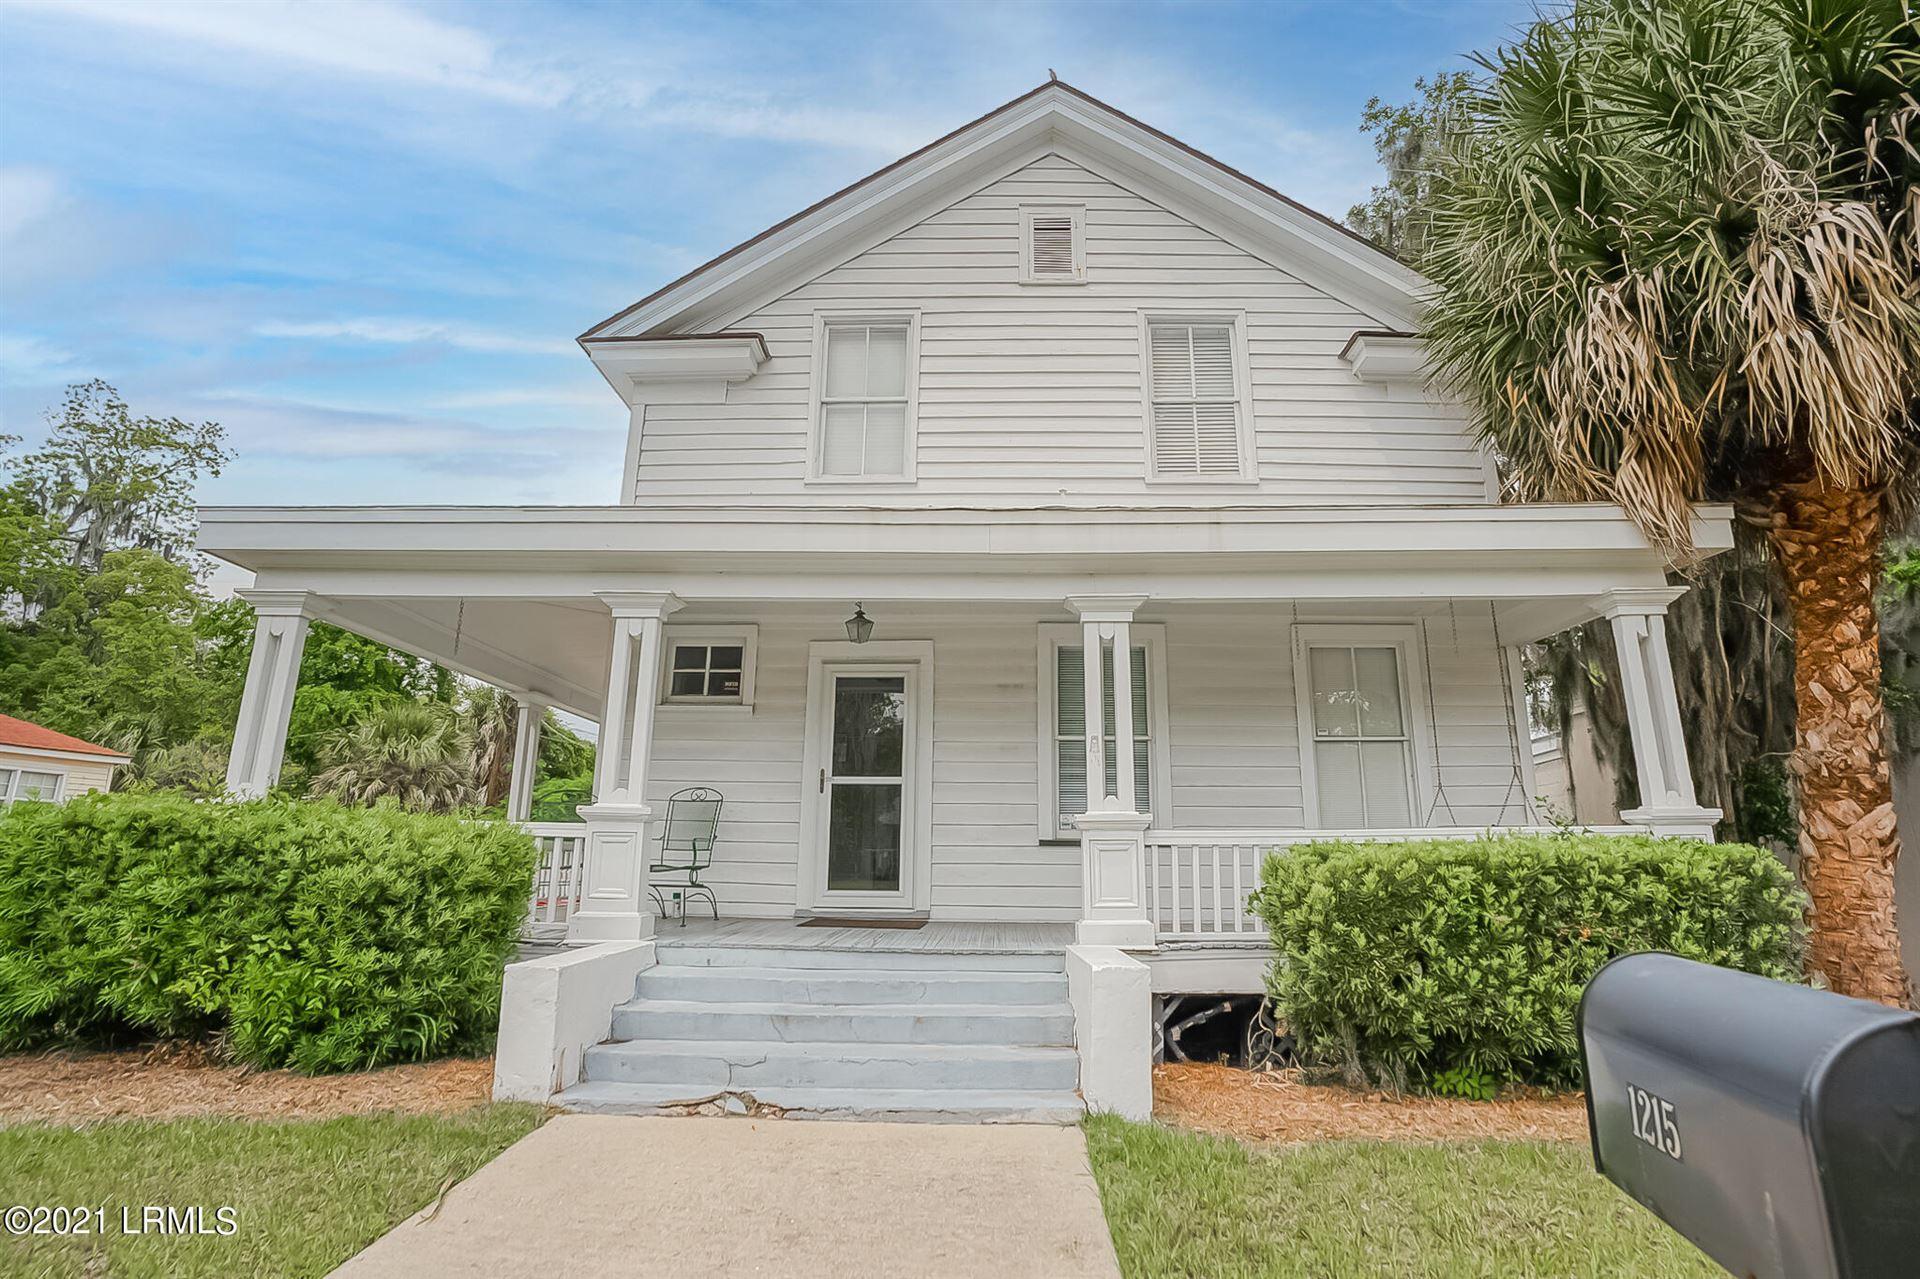 1215 Prince Street, Beaufort, SC 29902 - MLS#: 173235